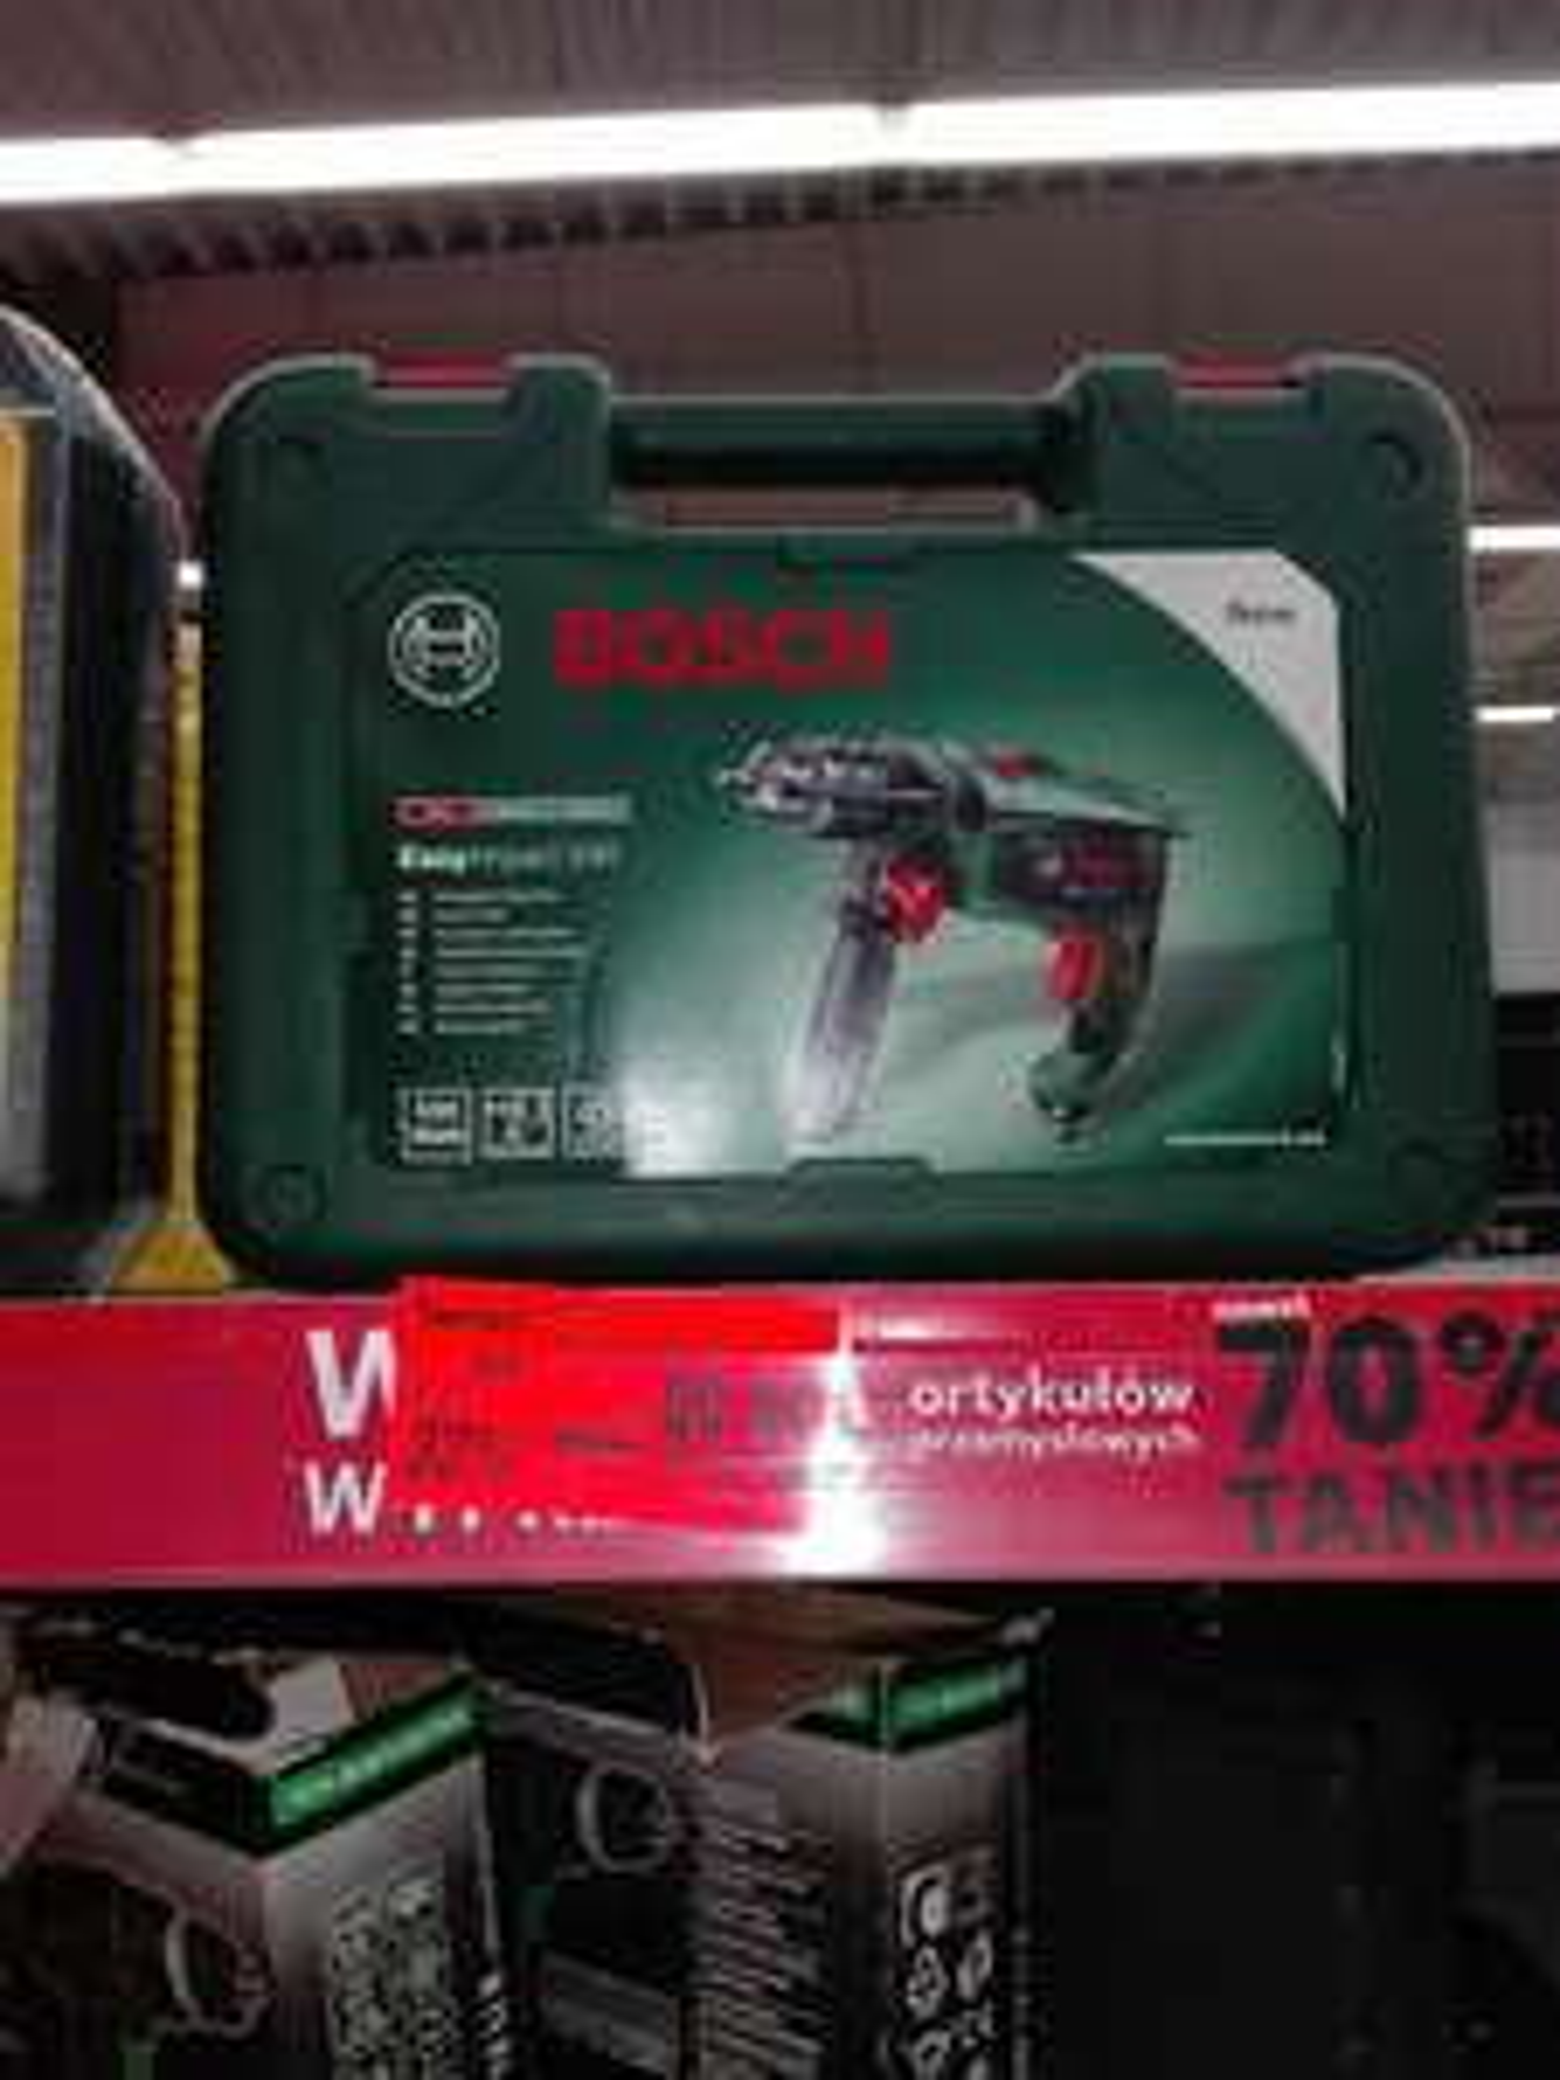 Wiertarka udarowa Bosch EasyImpact 540